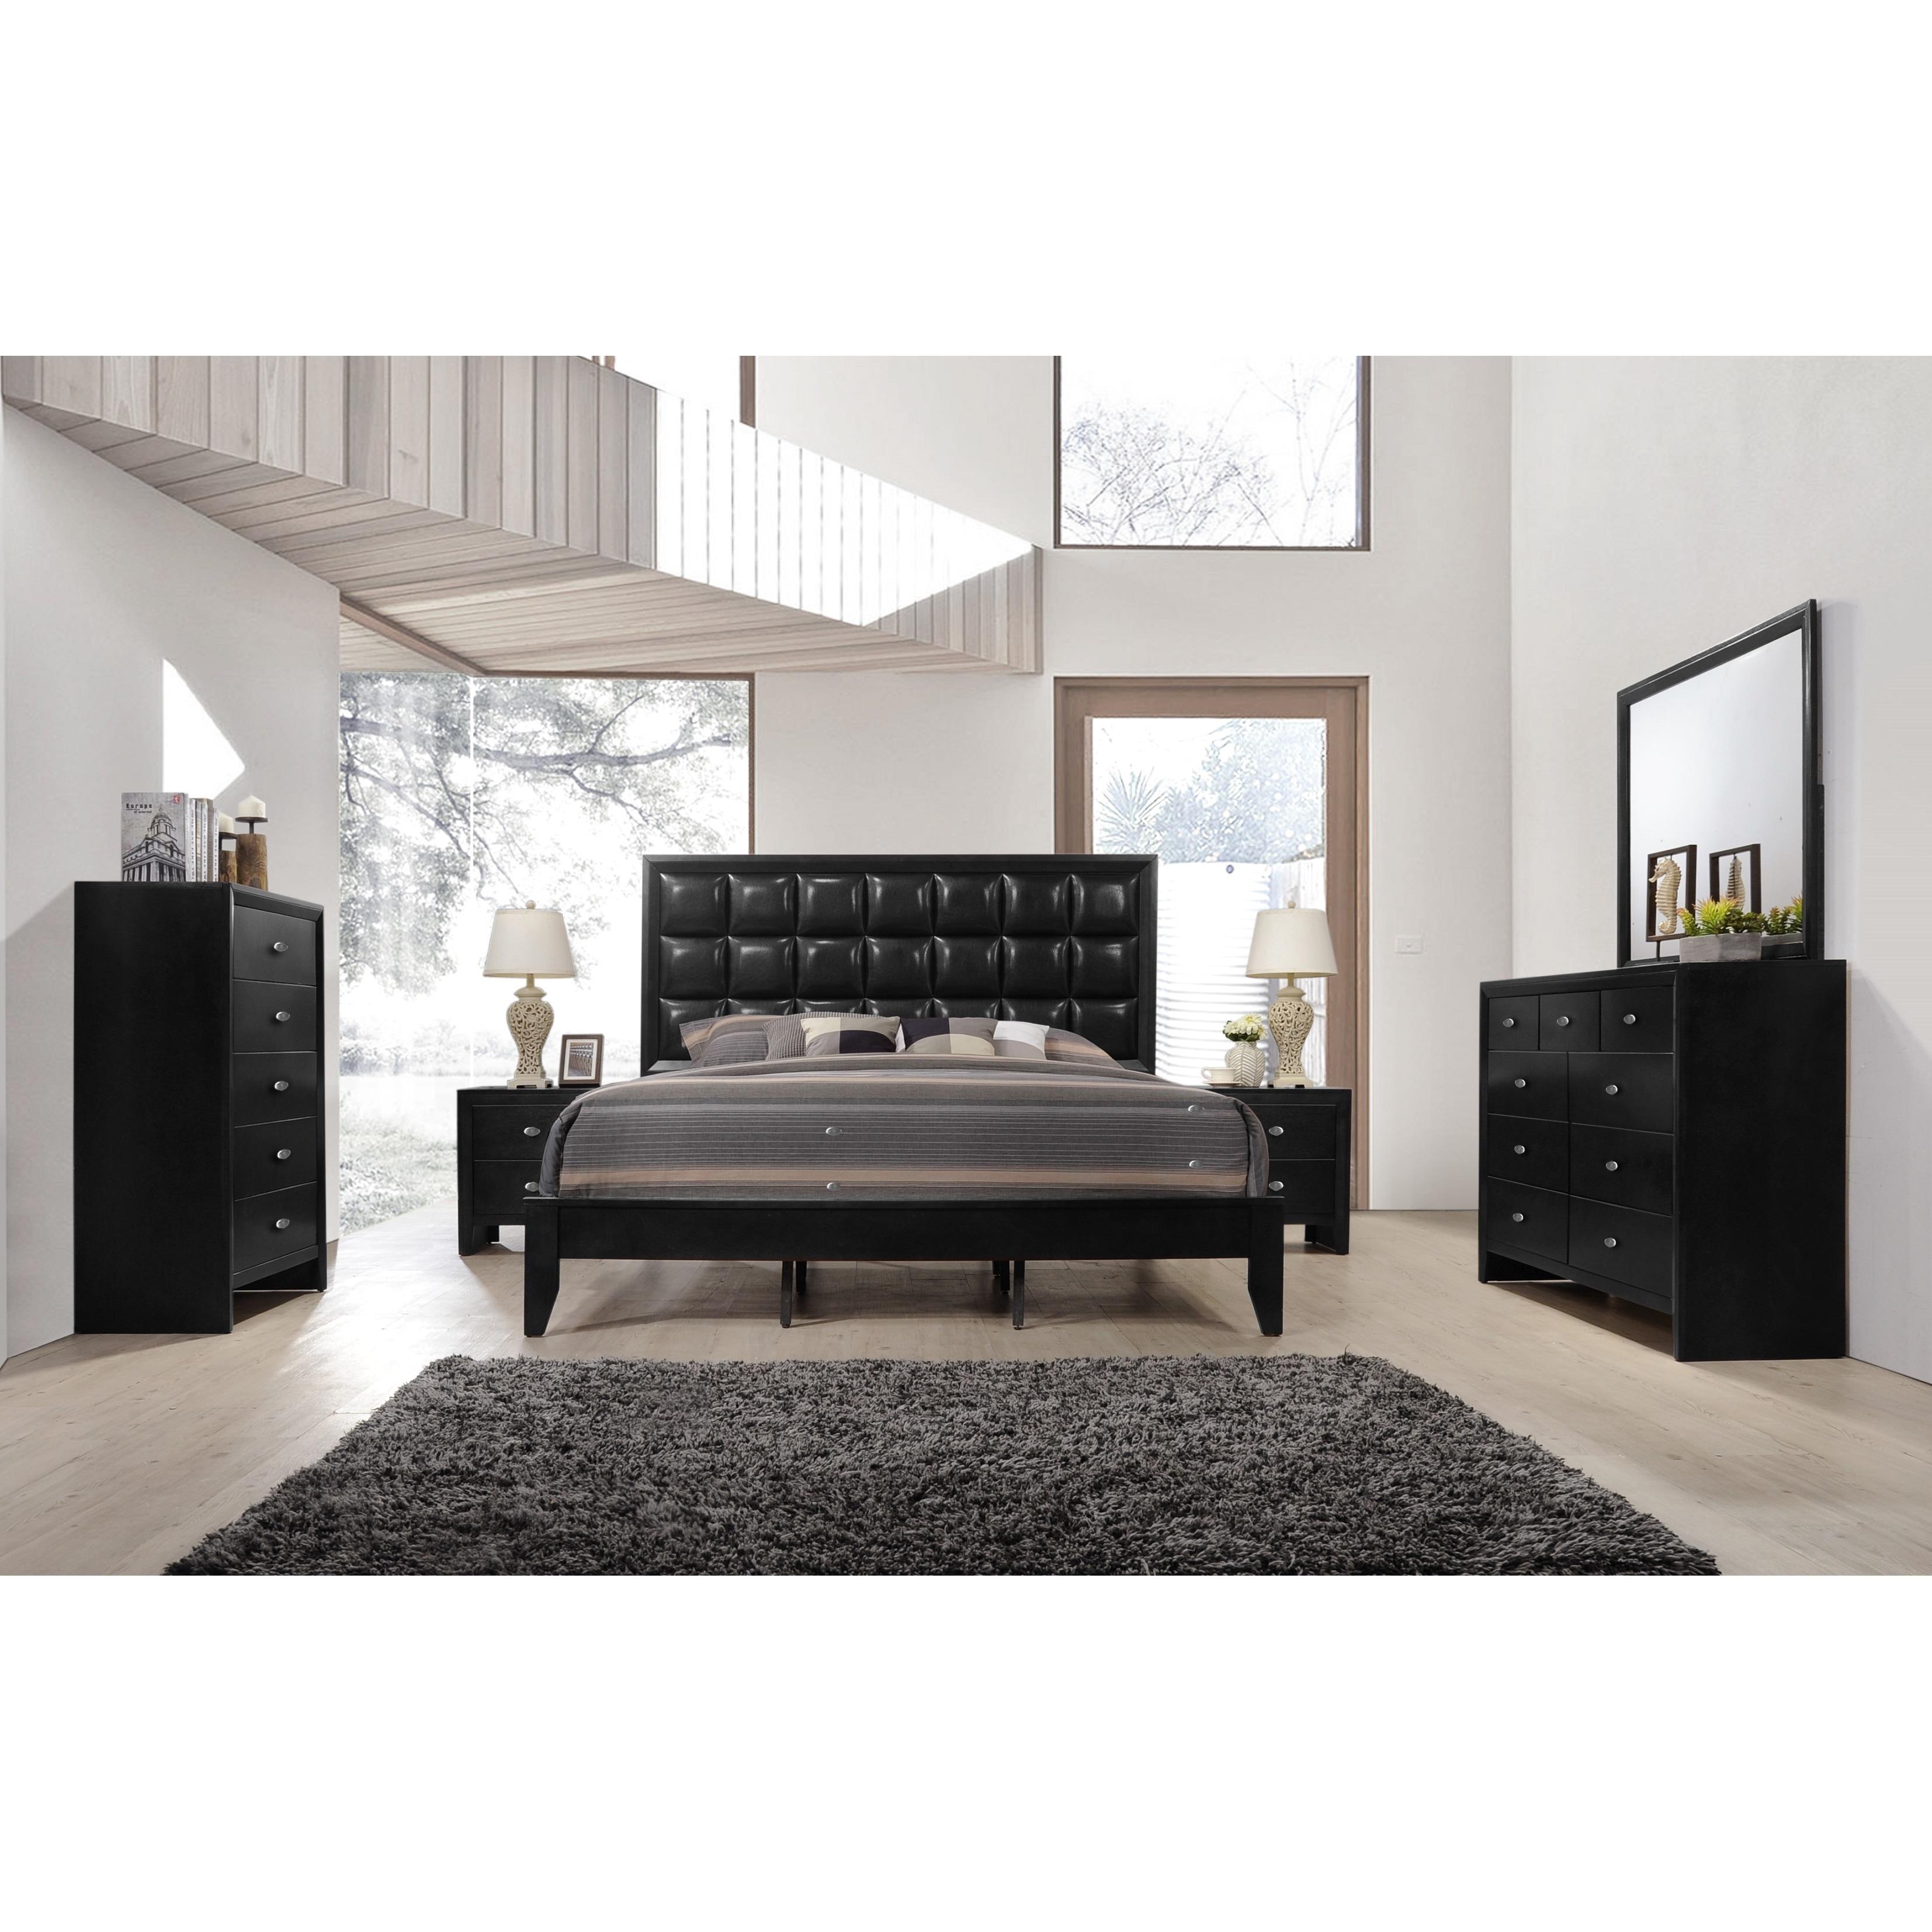 Shop Gloria 350 Black Finish Wood and Upholstered Bed Room Set, King ...